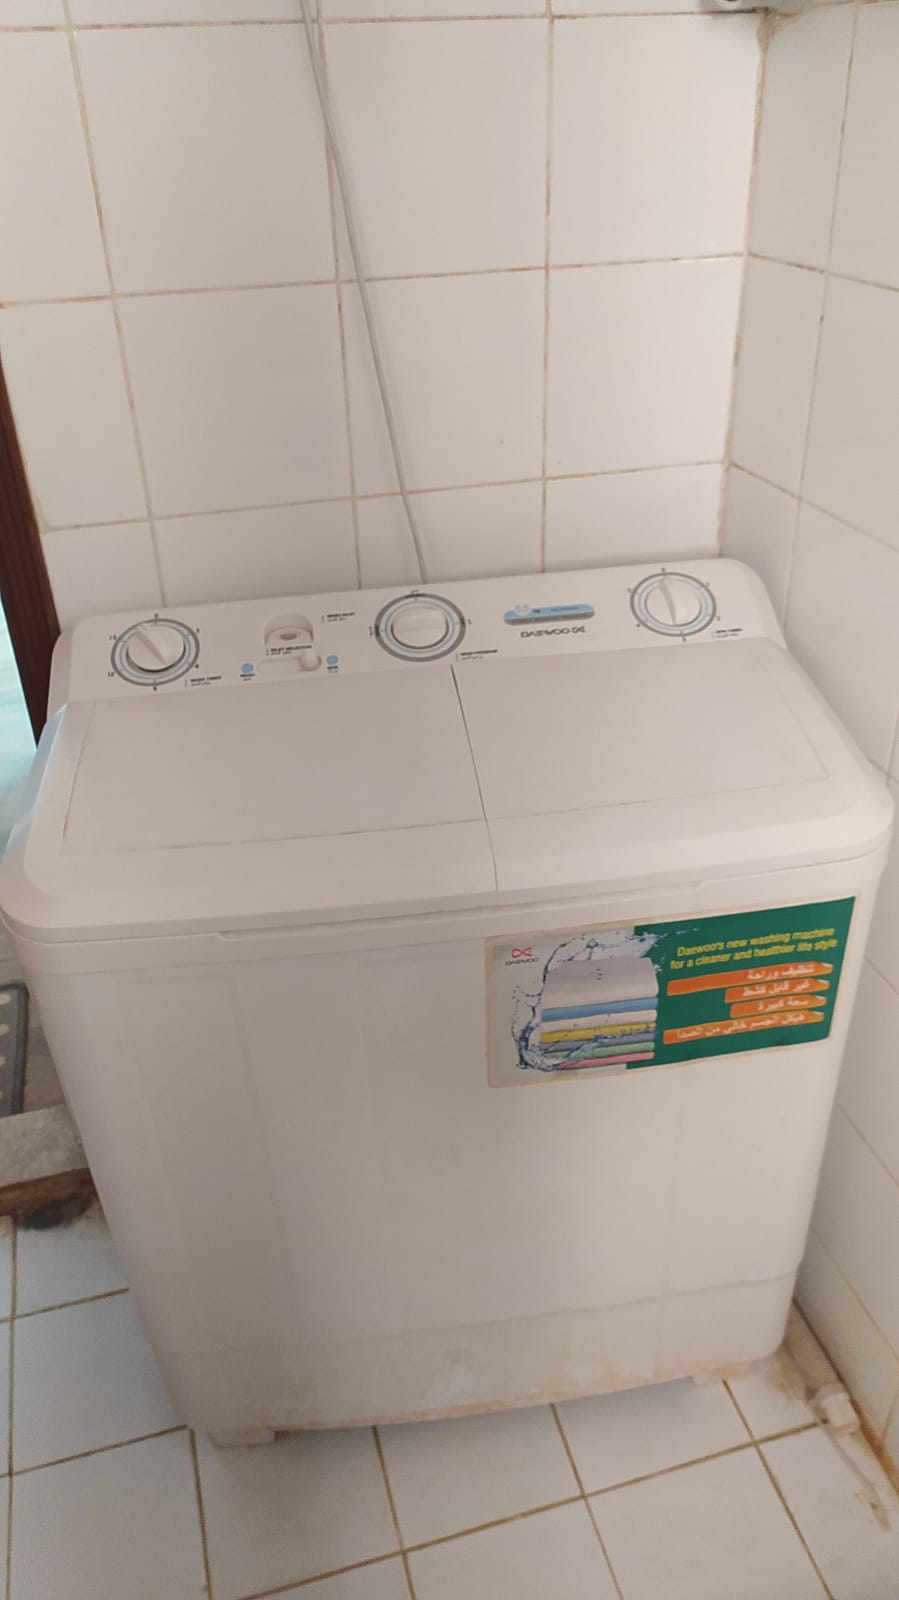 Washing machine, Metal Double Bed, Oil heater, Table, stroller, babywalker